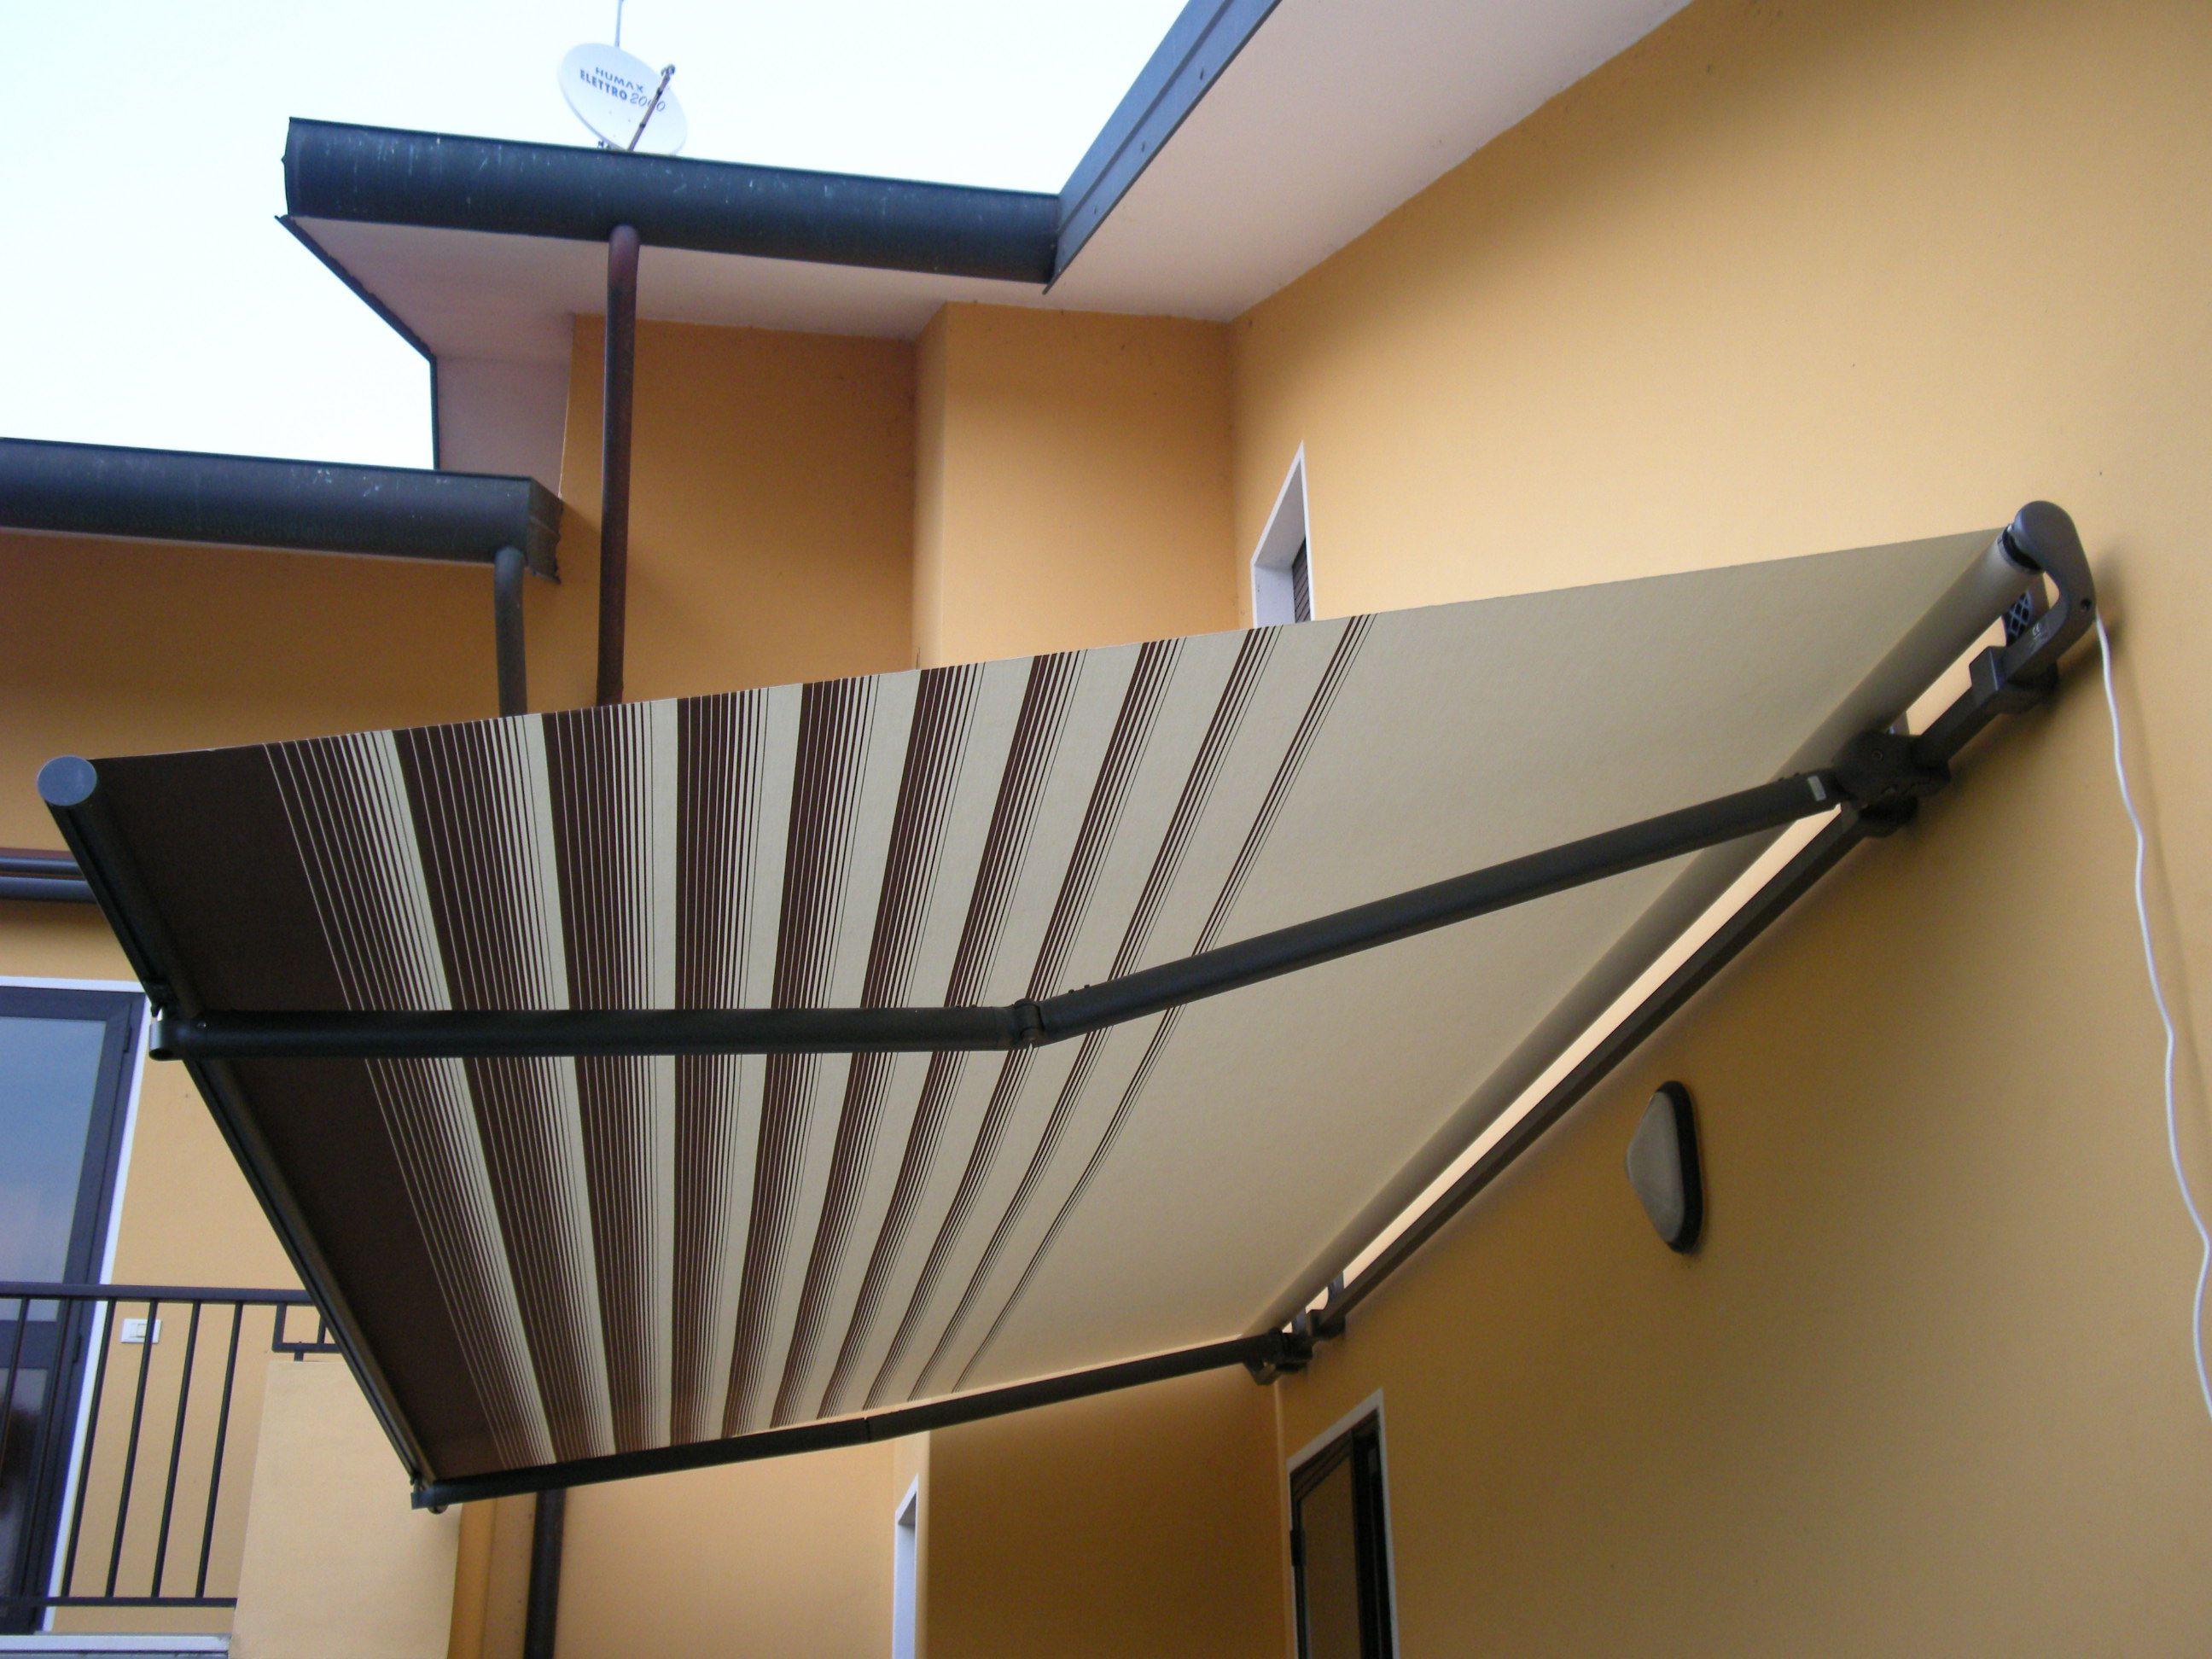 European window coverings  klip folding arm awning  open wall by inspired window coverings